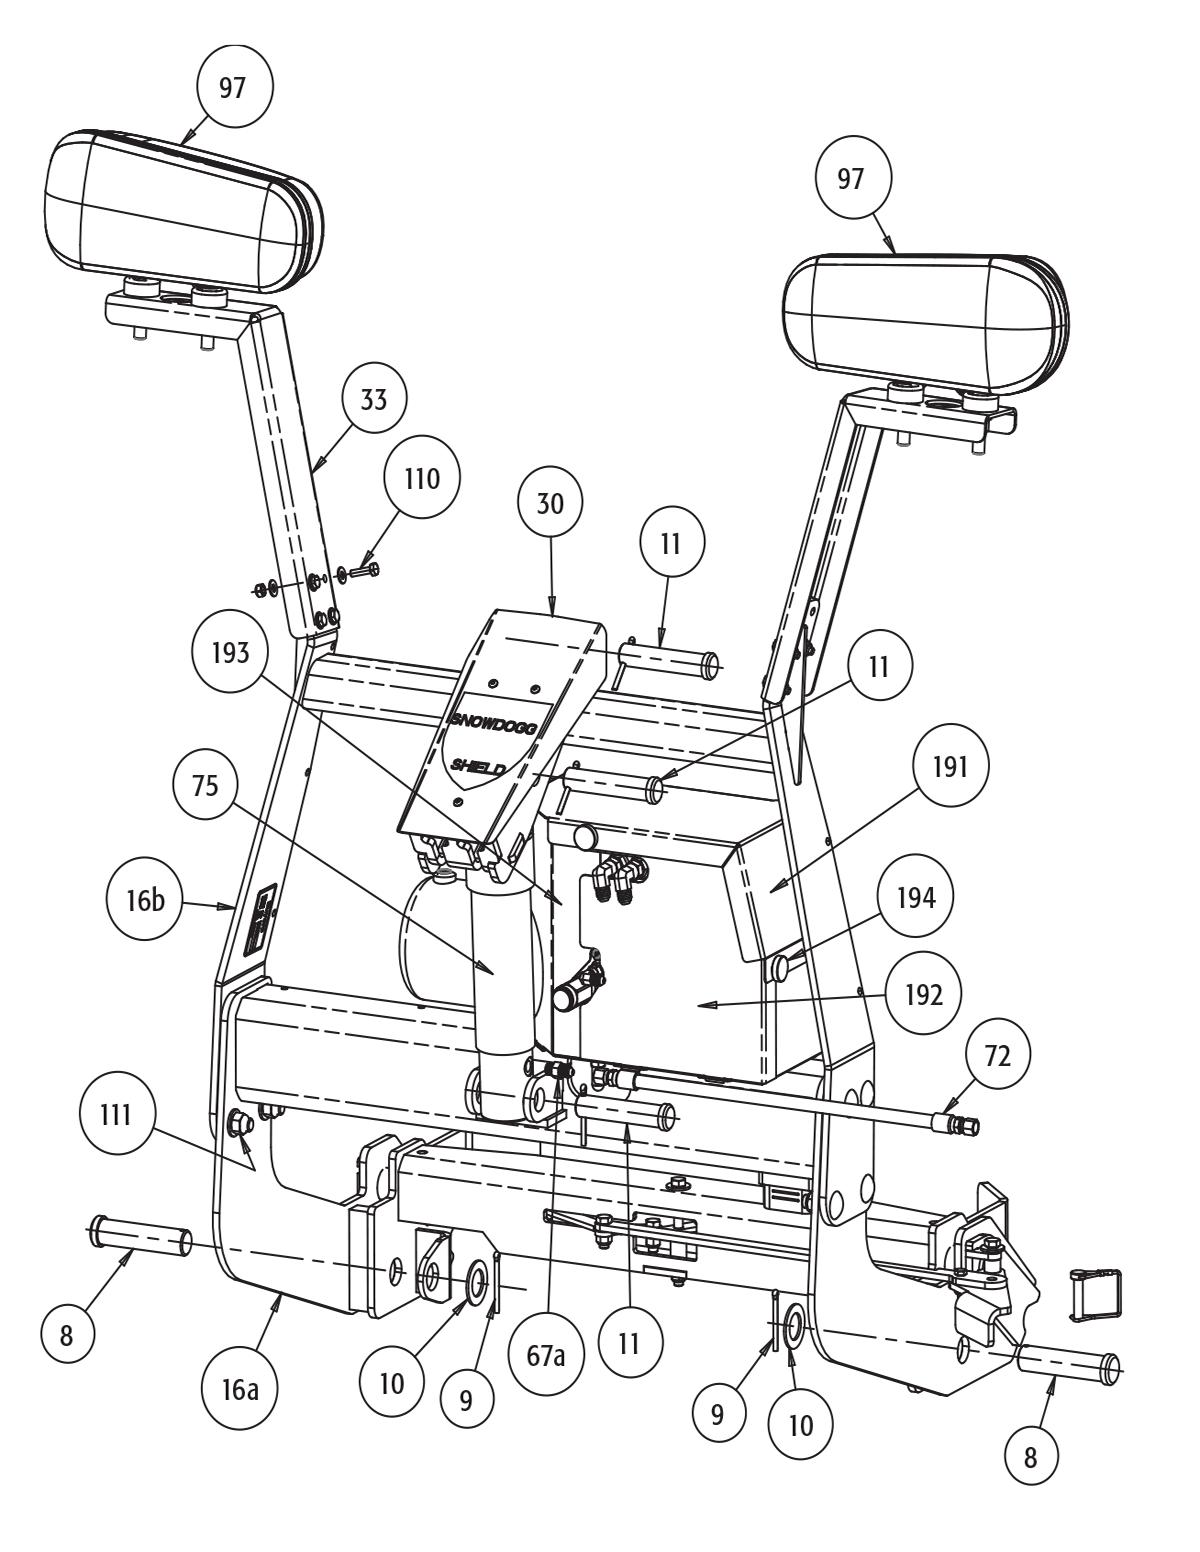 hight resolution of western unimount wiring diagram 97 chevy western unimount plow wiring western unimount plow wiring